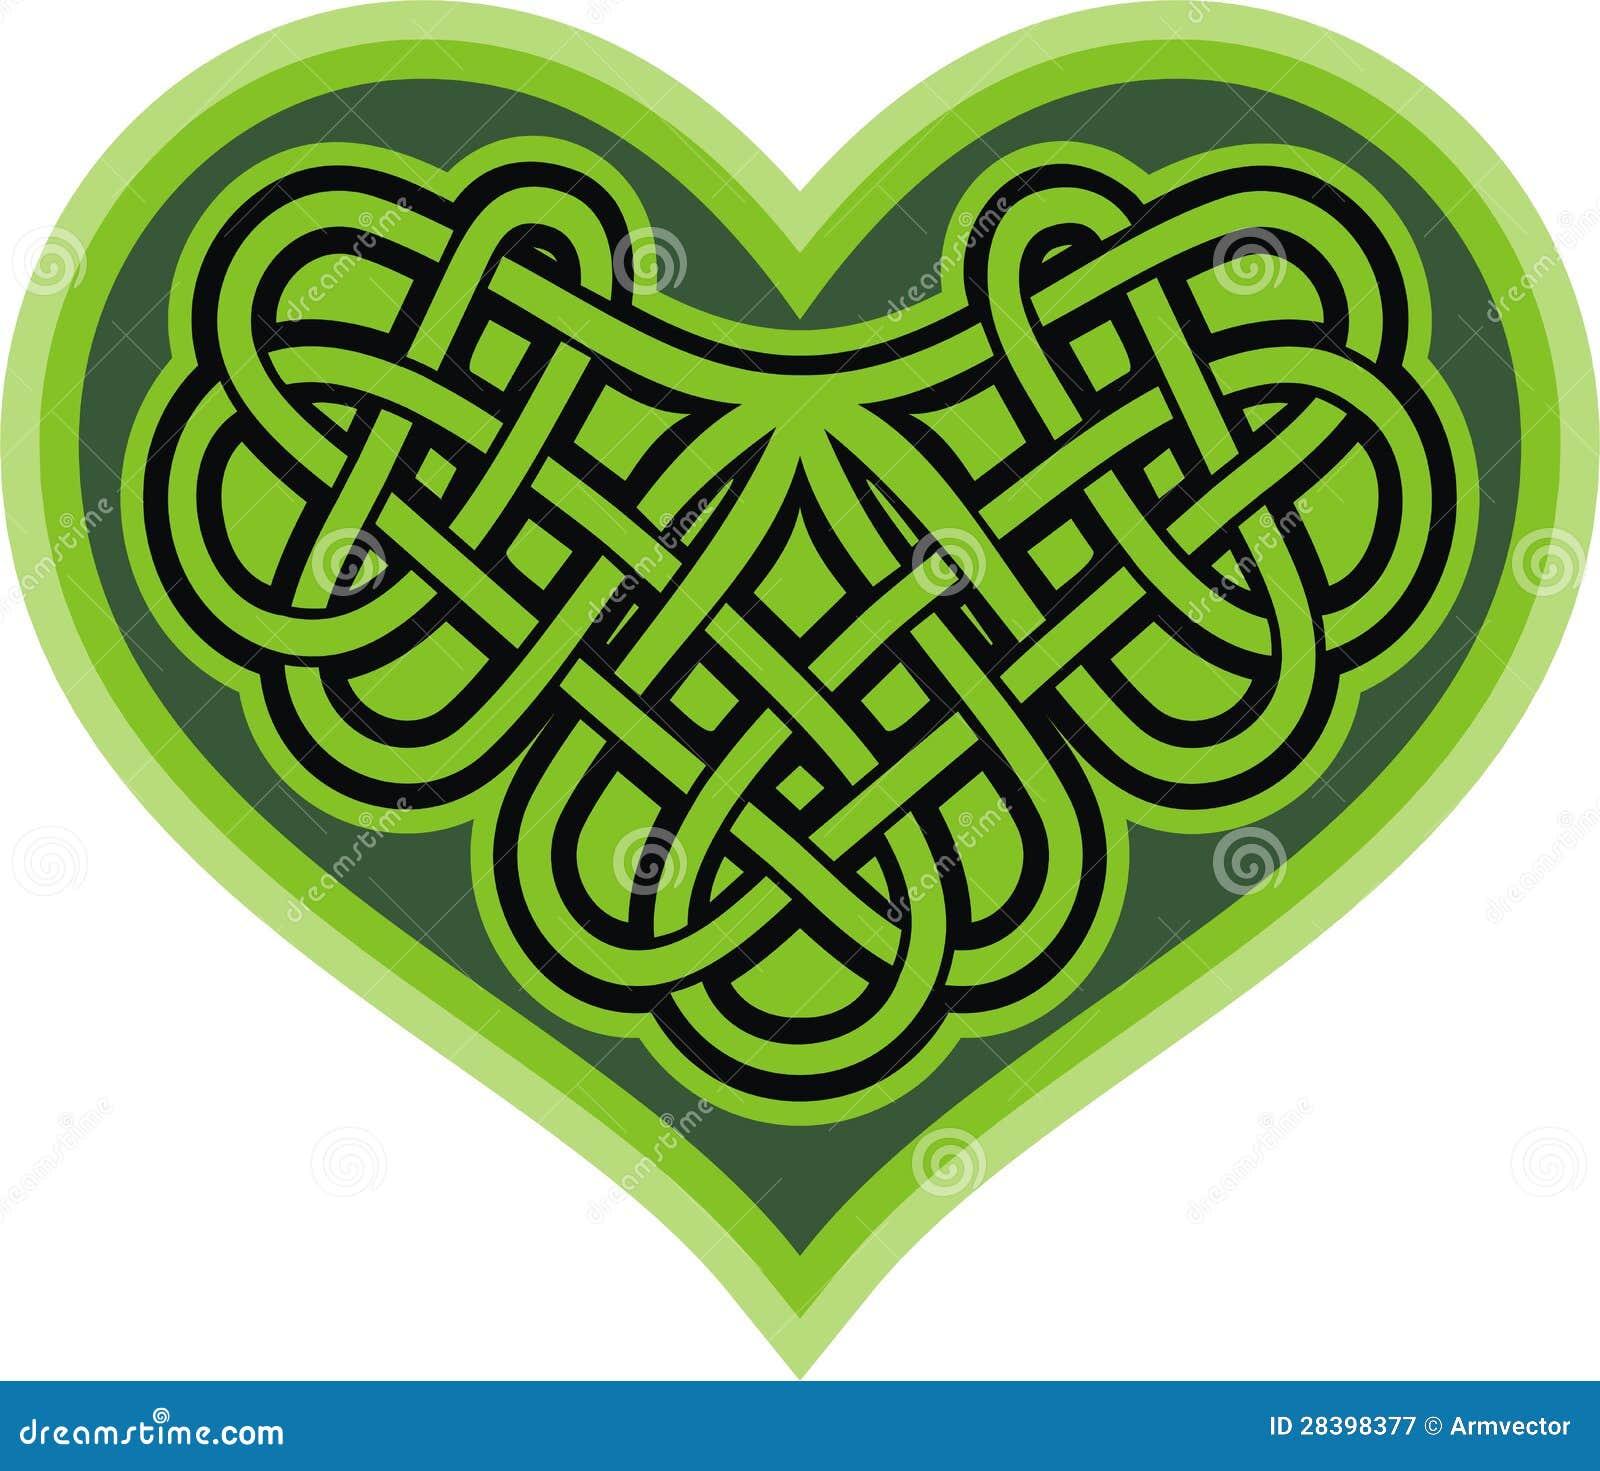 Celtic Cross With Shamrock Shamrock heart. celtic symbol